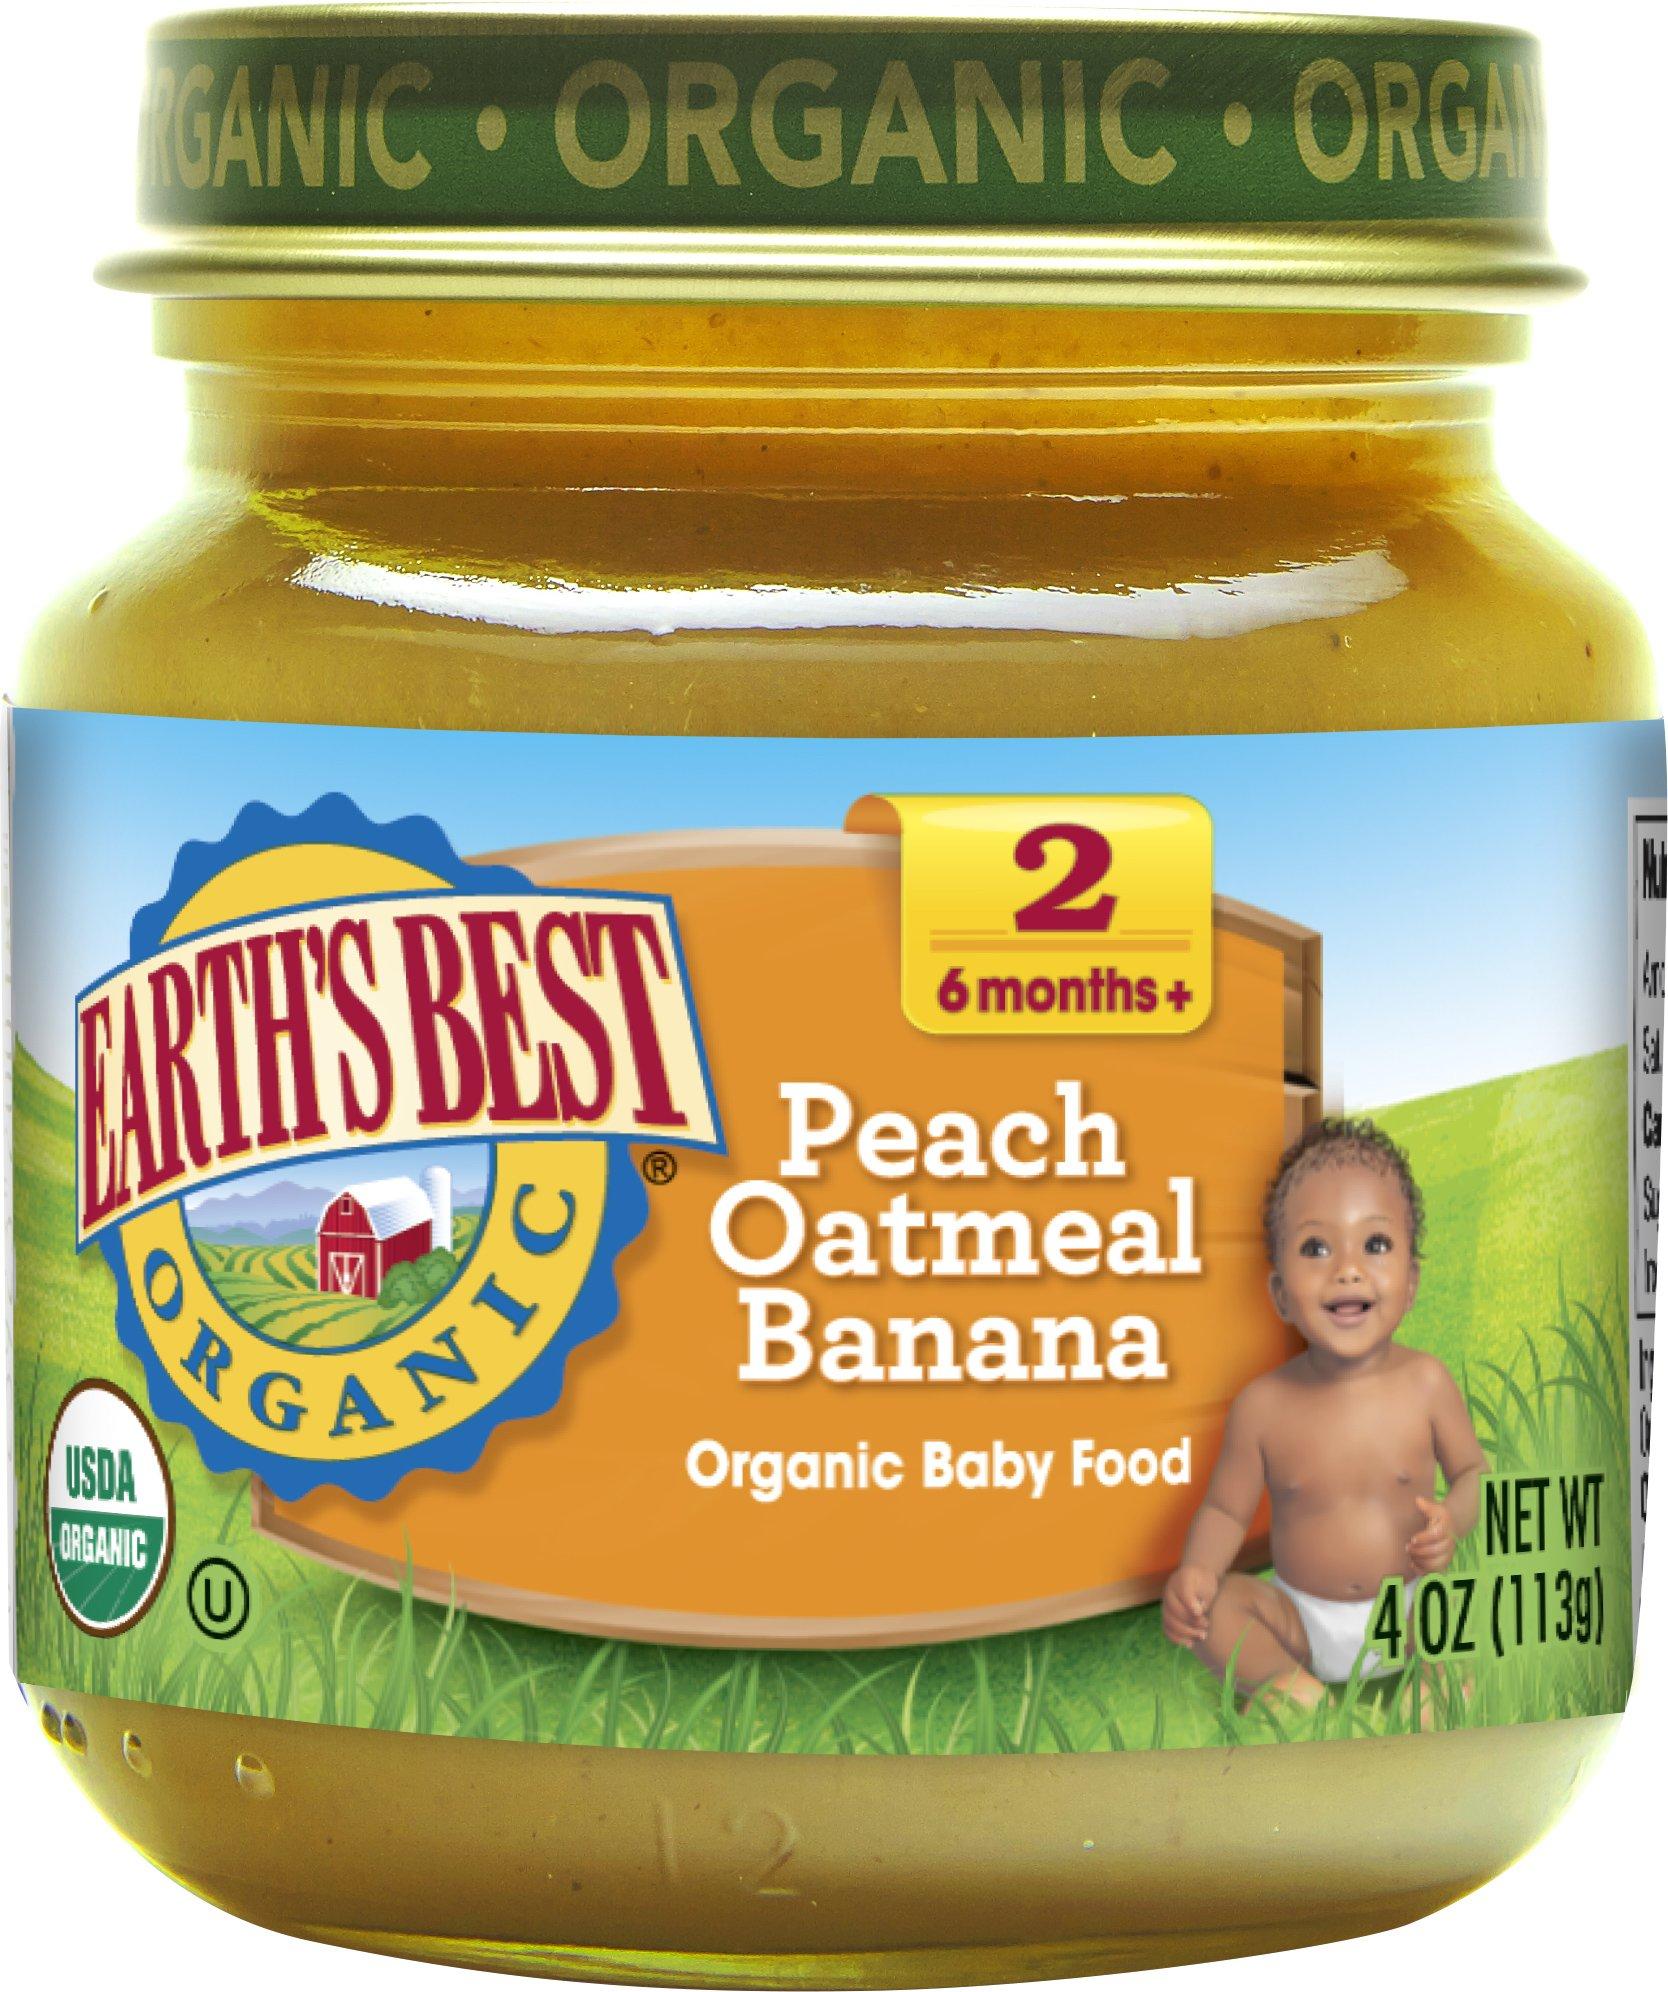 Earth's Best Peach Oatmeal Banana, 4 oz by Earth's Best